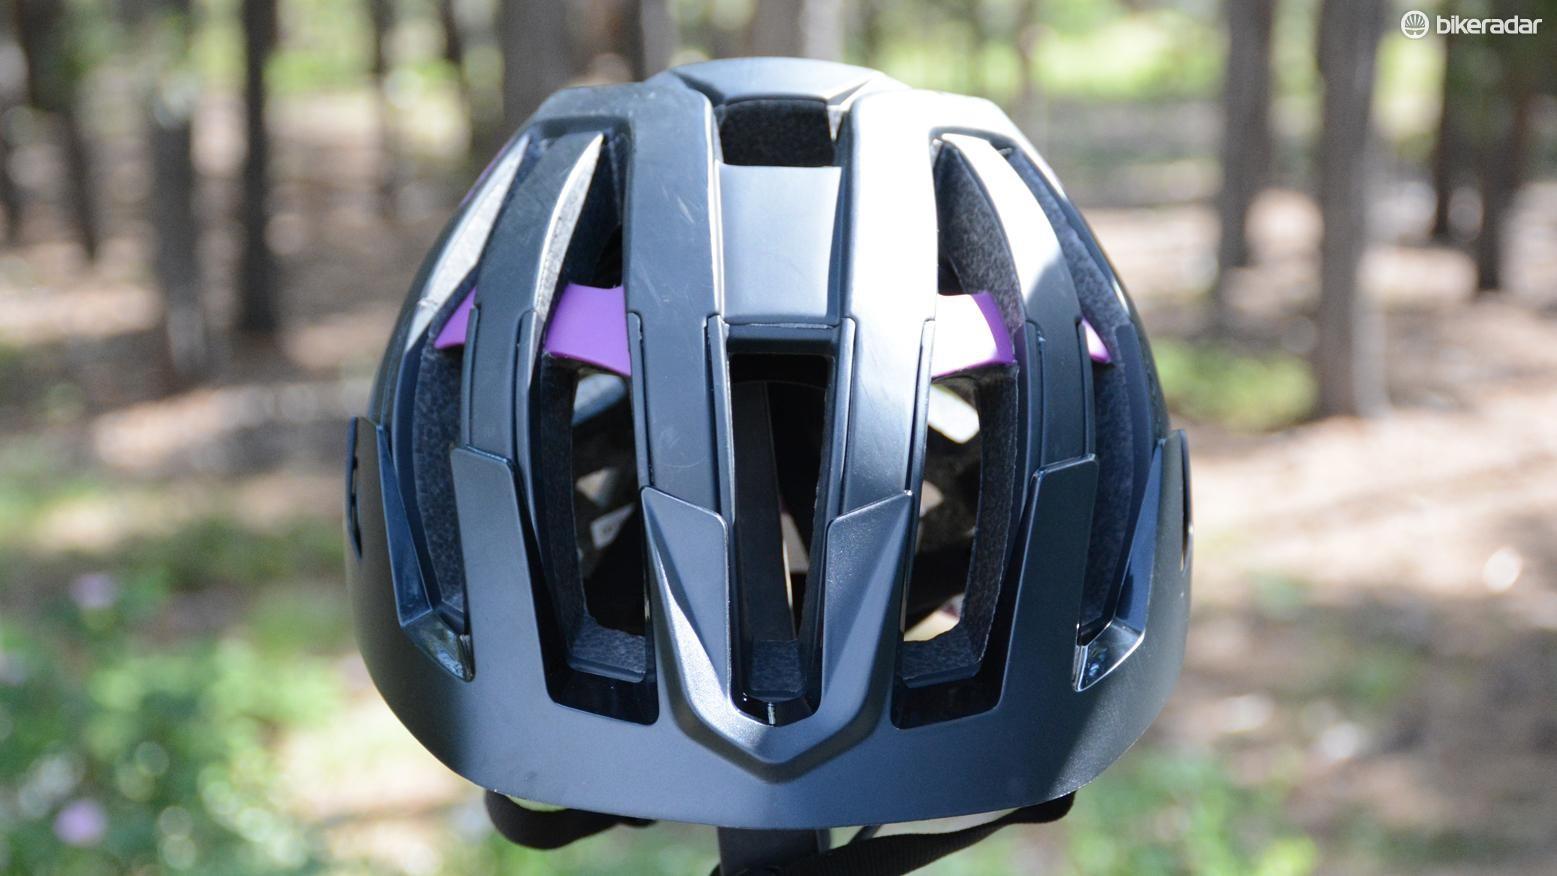 Kali Interceptor helmet review - BikeRadar